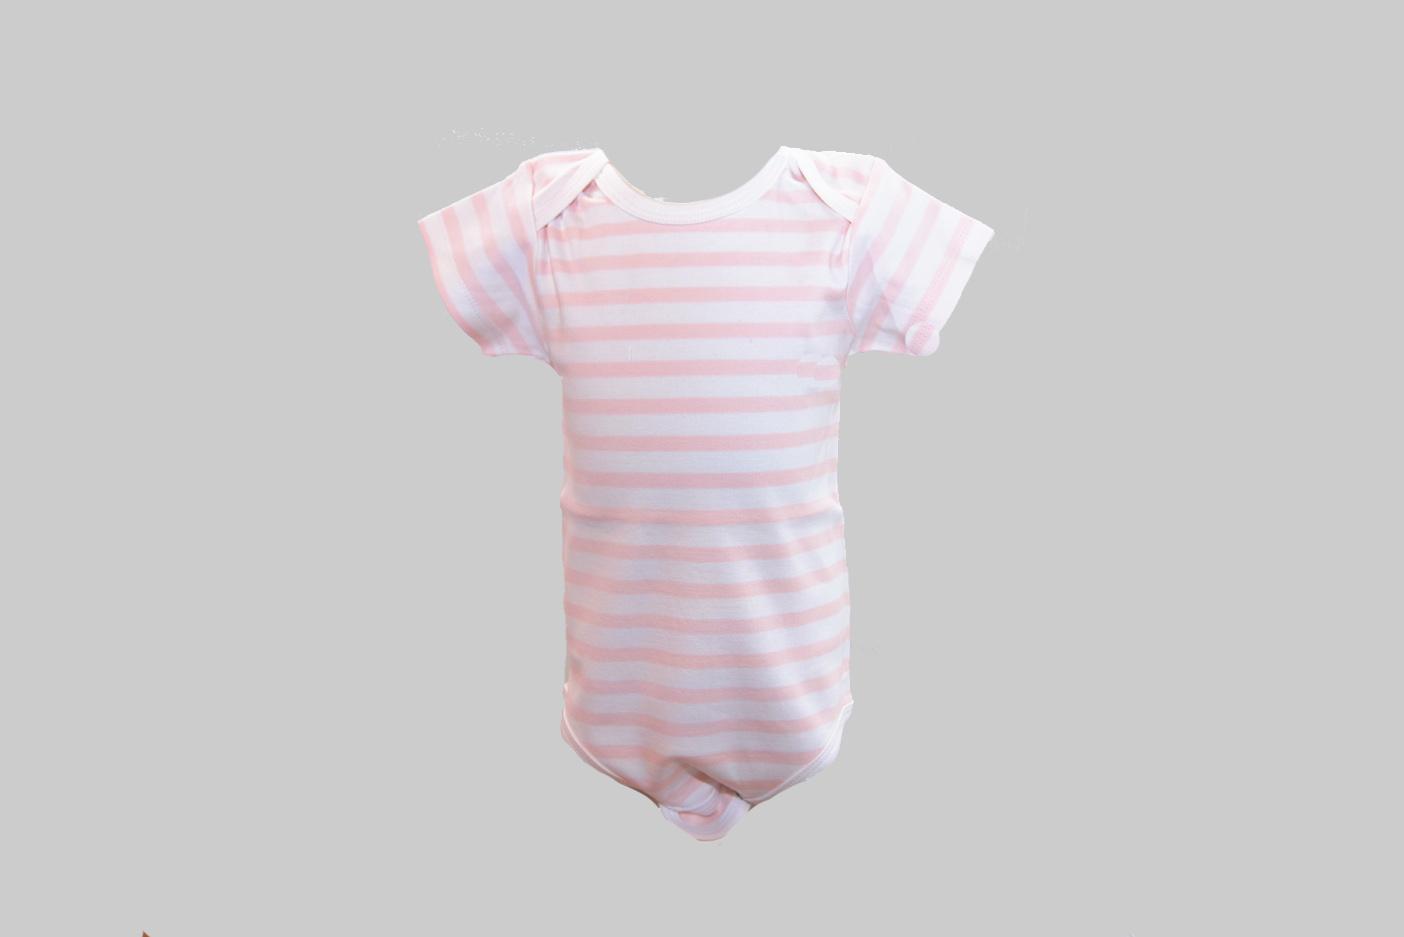 Soft Pink Color Stripe Baby Jumpsuit